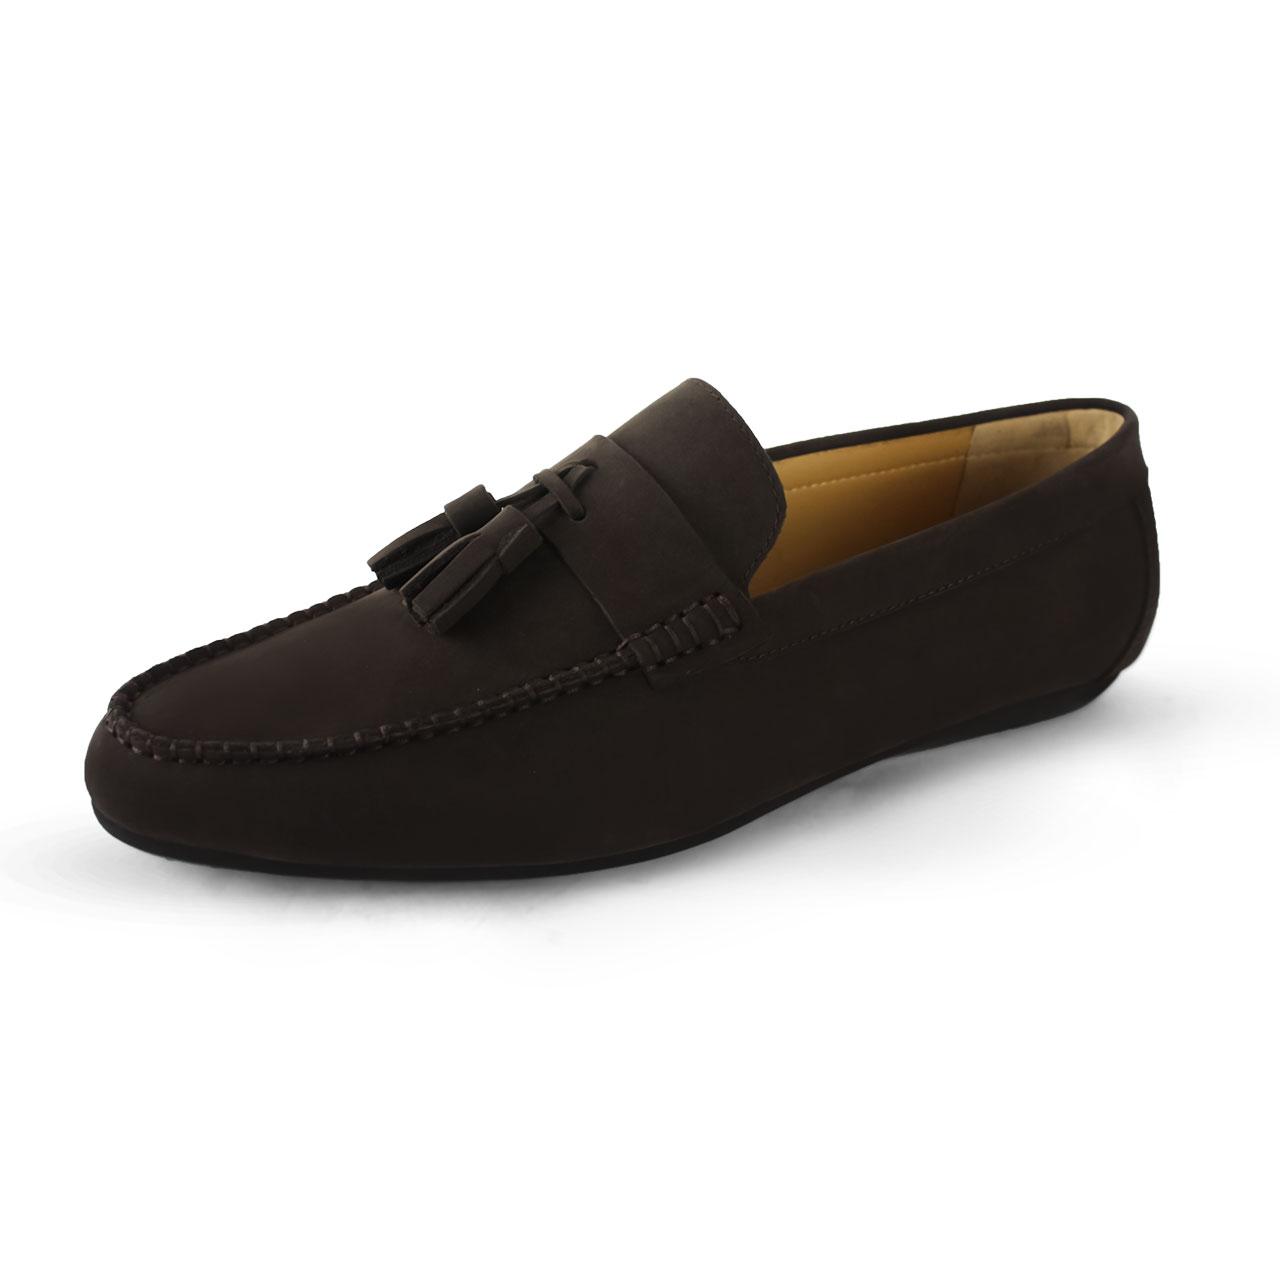 Men's Shoes Suede Comfort Slip On Kiltie Loafers